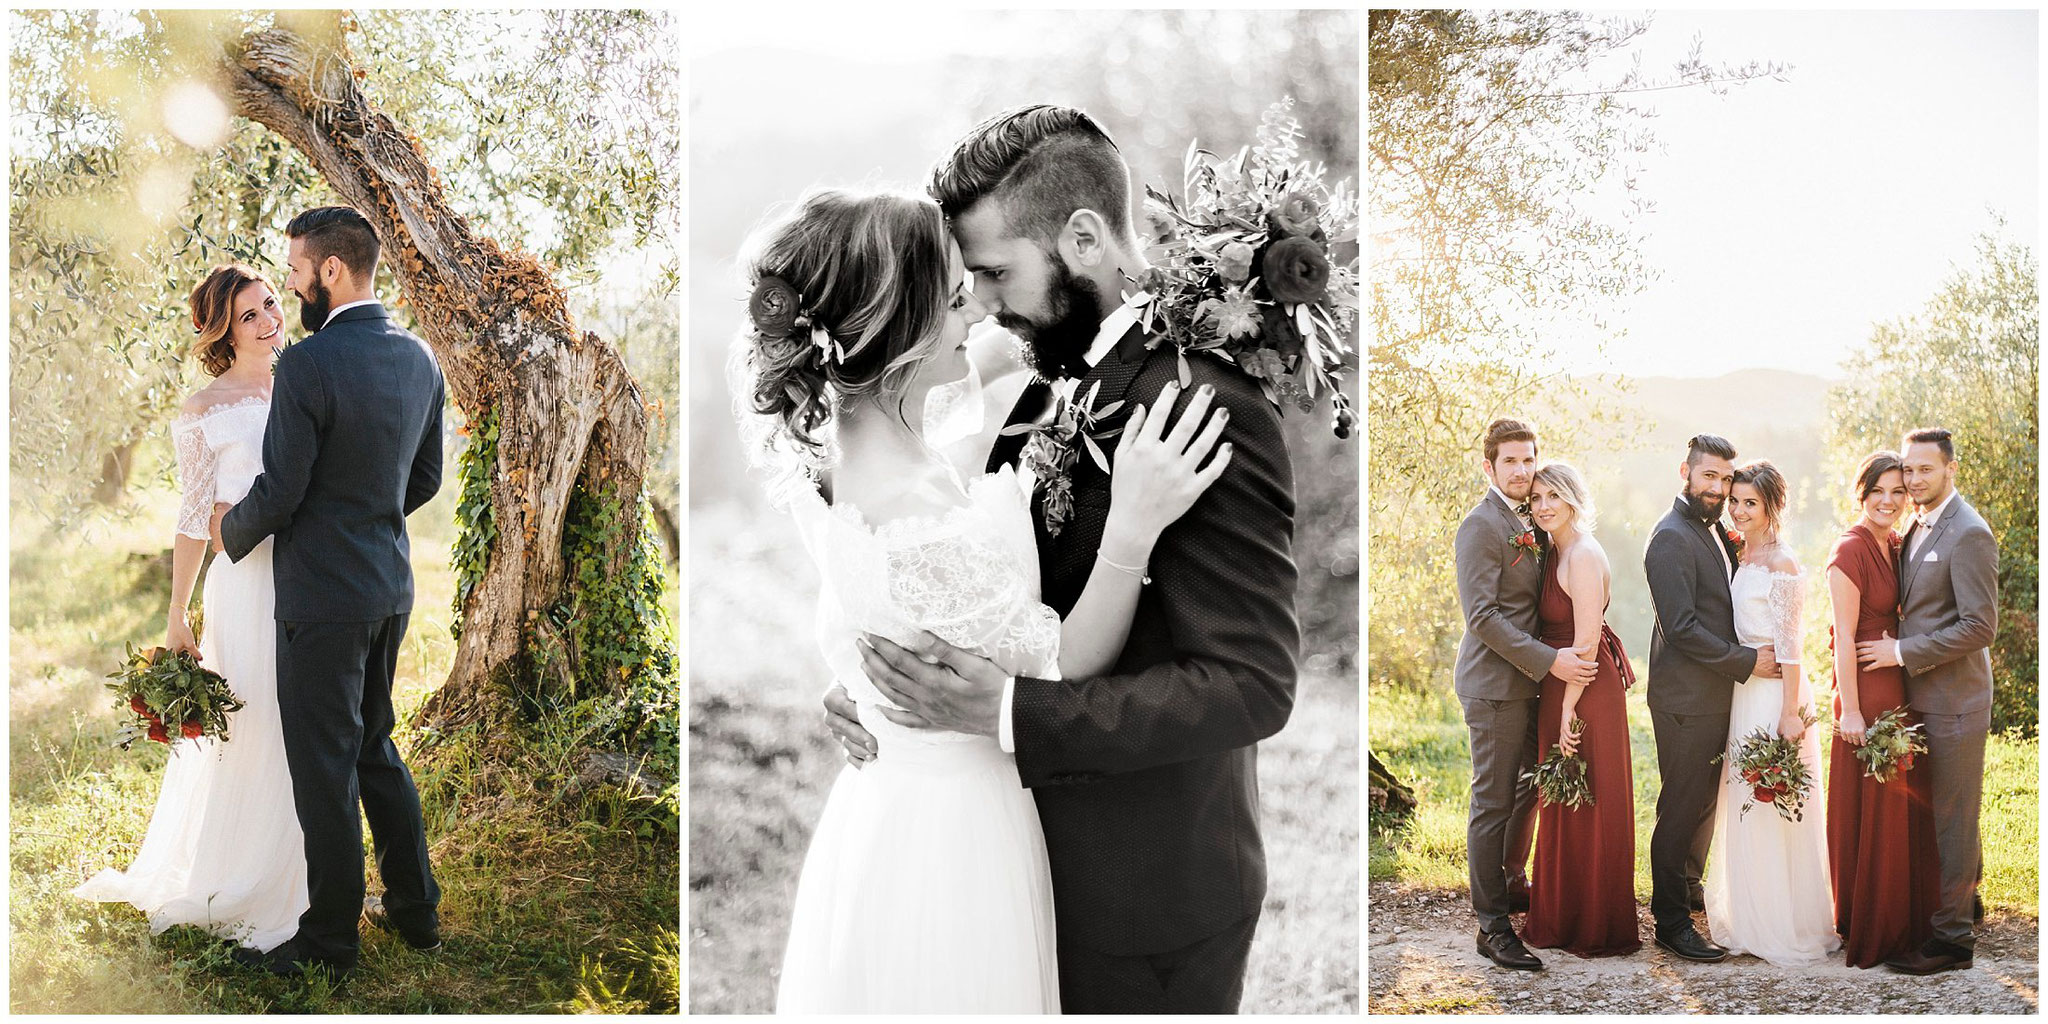 Italien Hochzeitsfotograf Toskana jane weber Olivenbäume